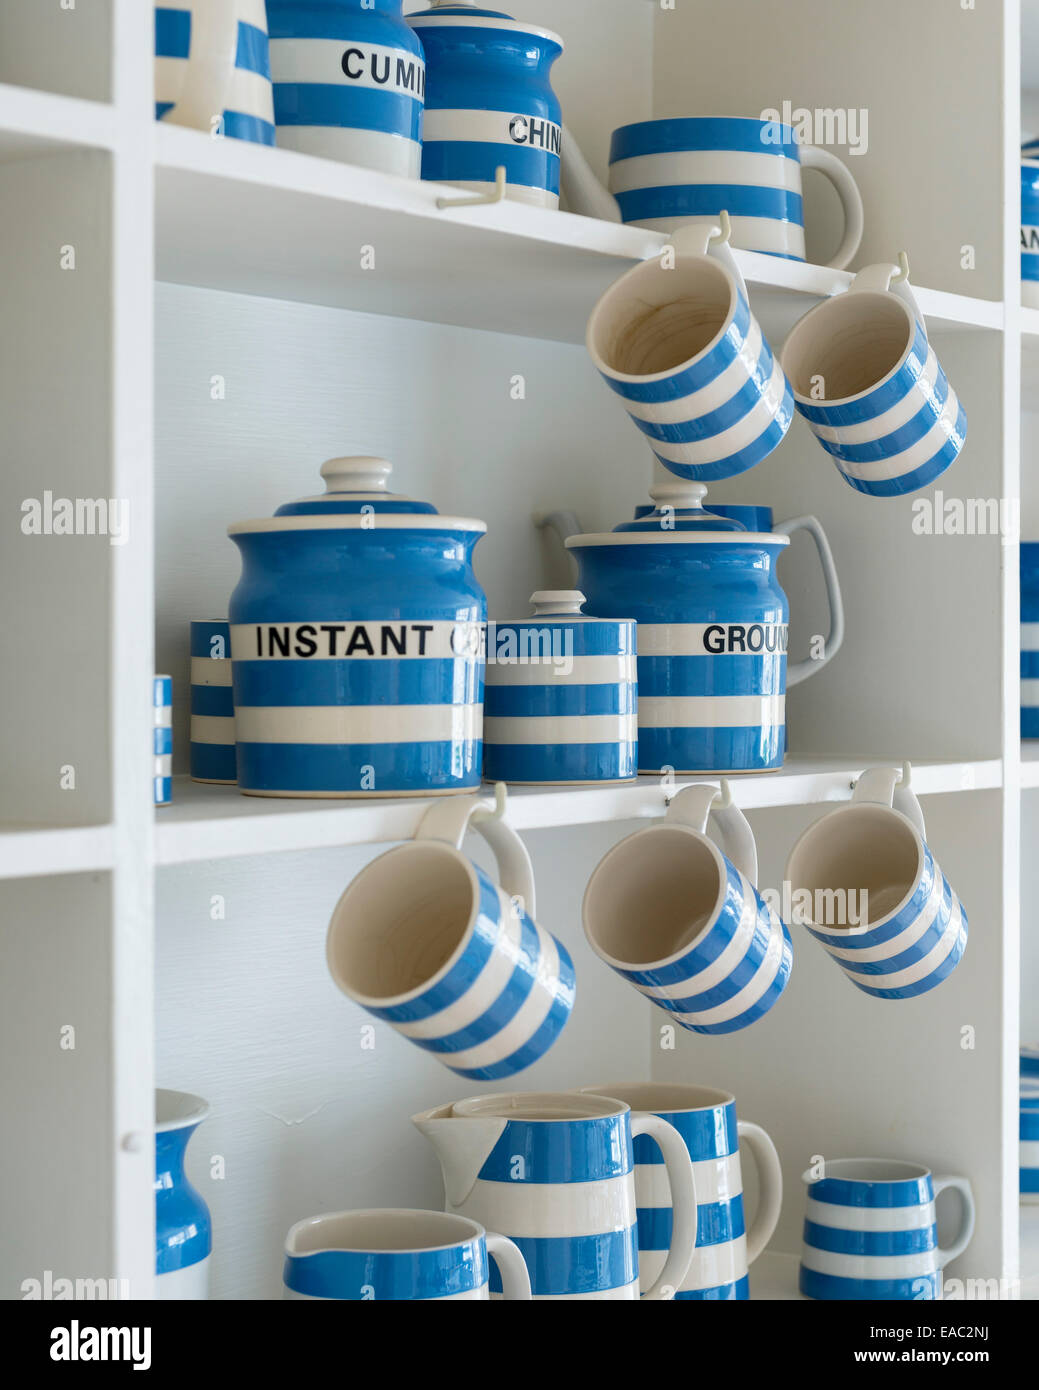 Dresser Stock Photos & Dresser Stock Images - Alamy